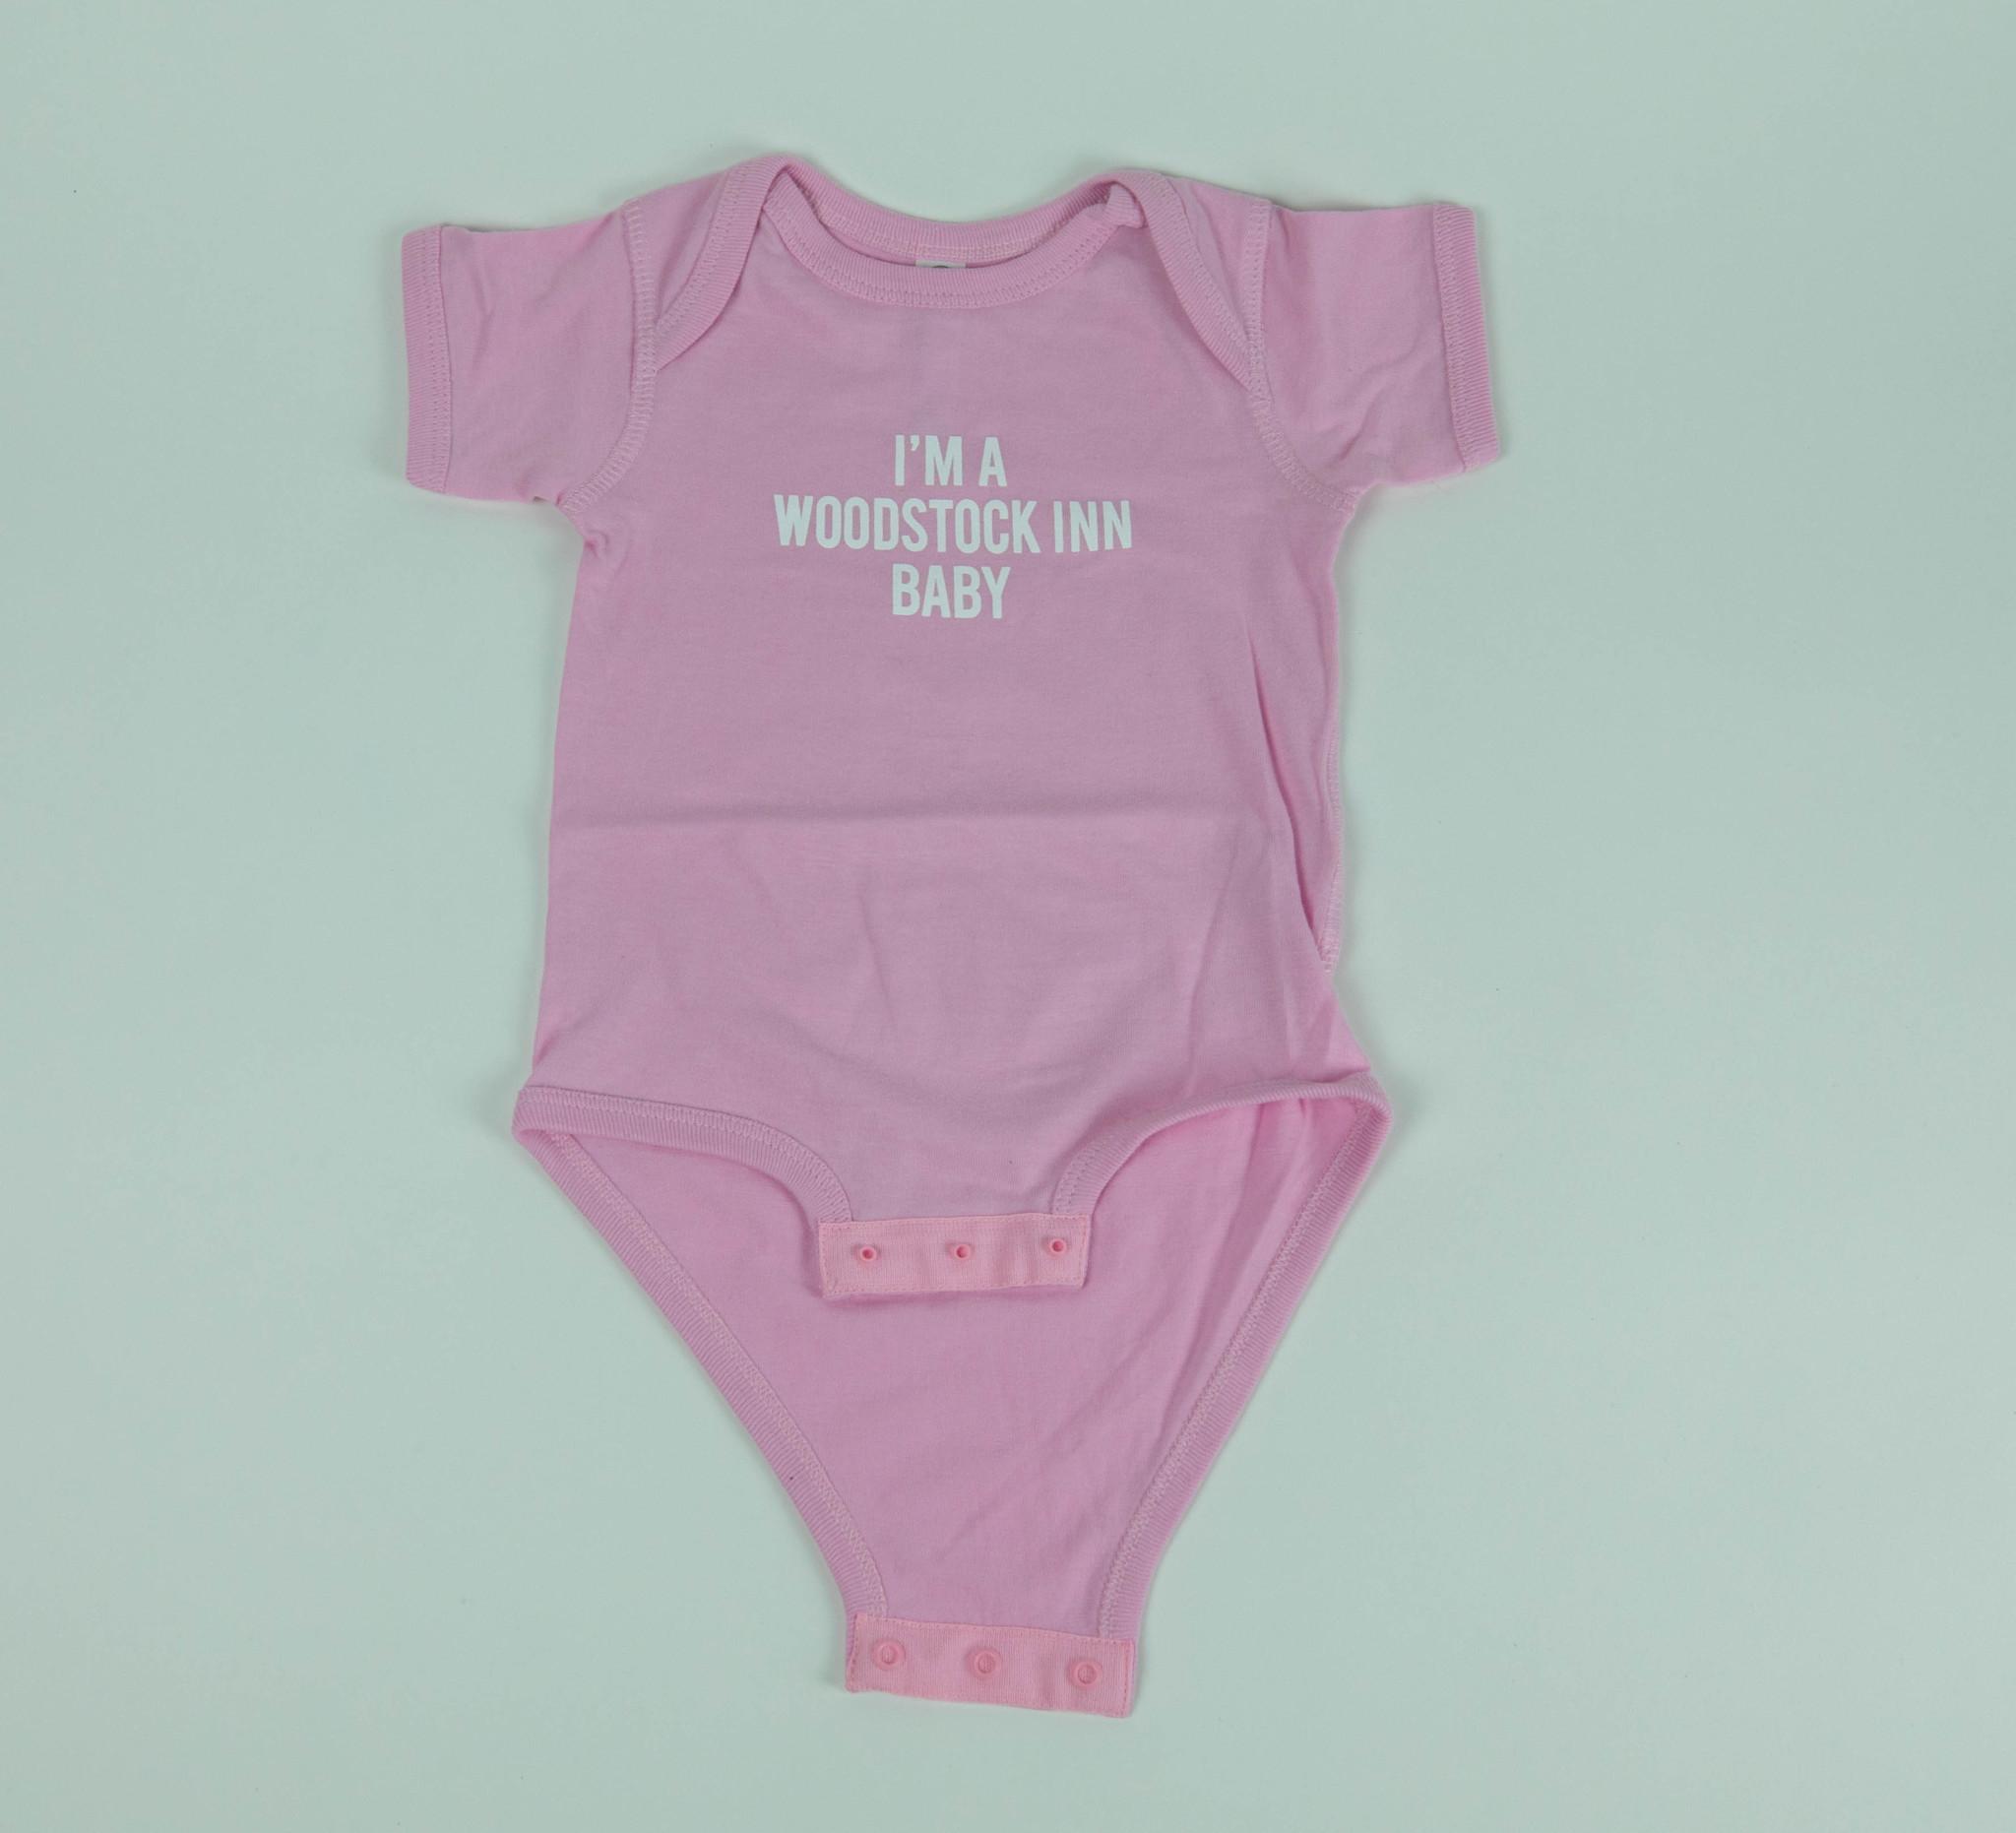 Baby Infant Onesies Blue & Pink